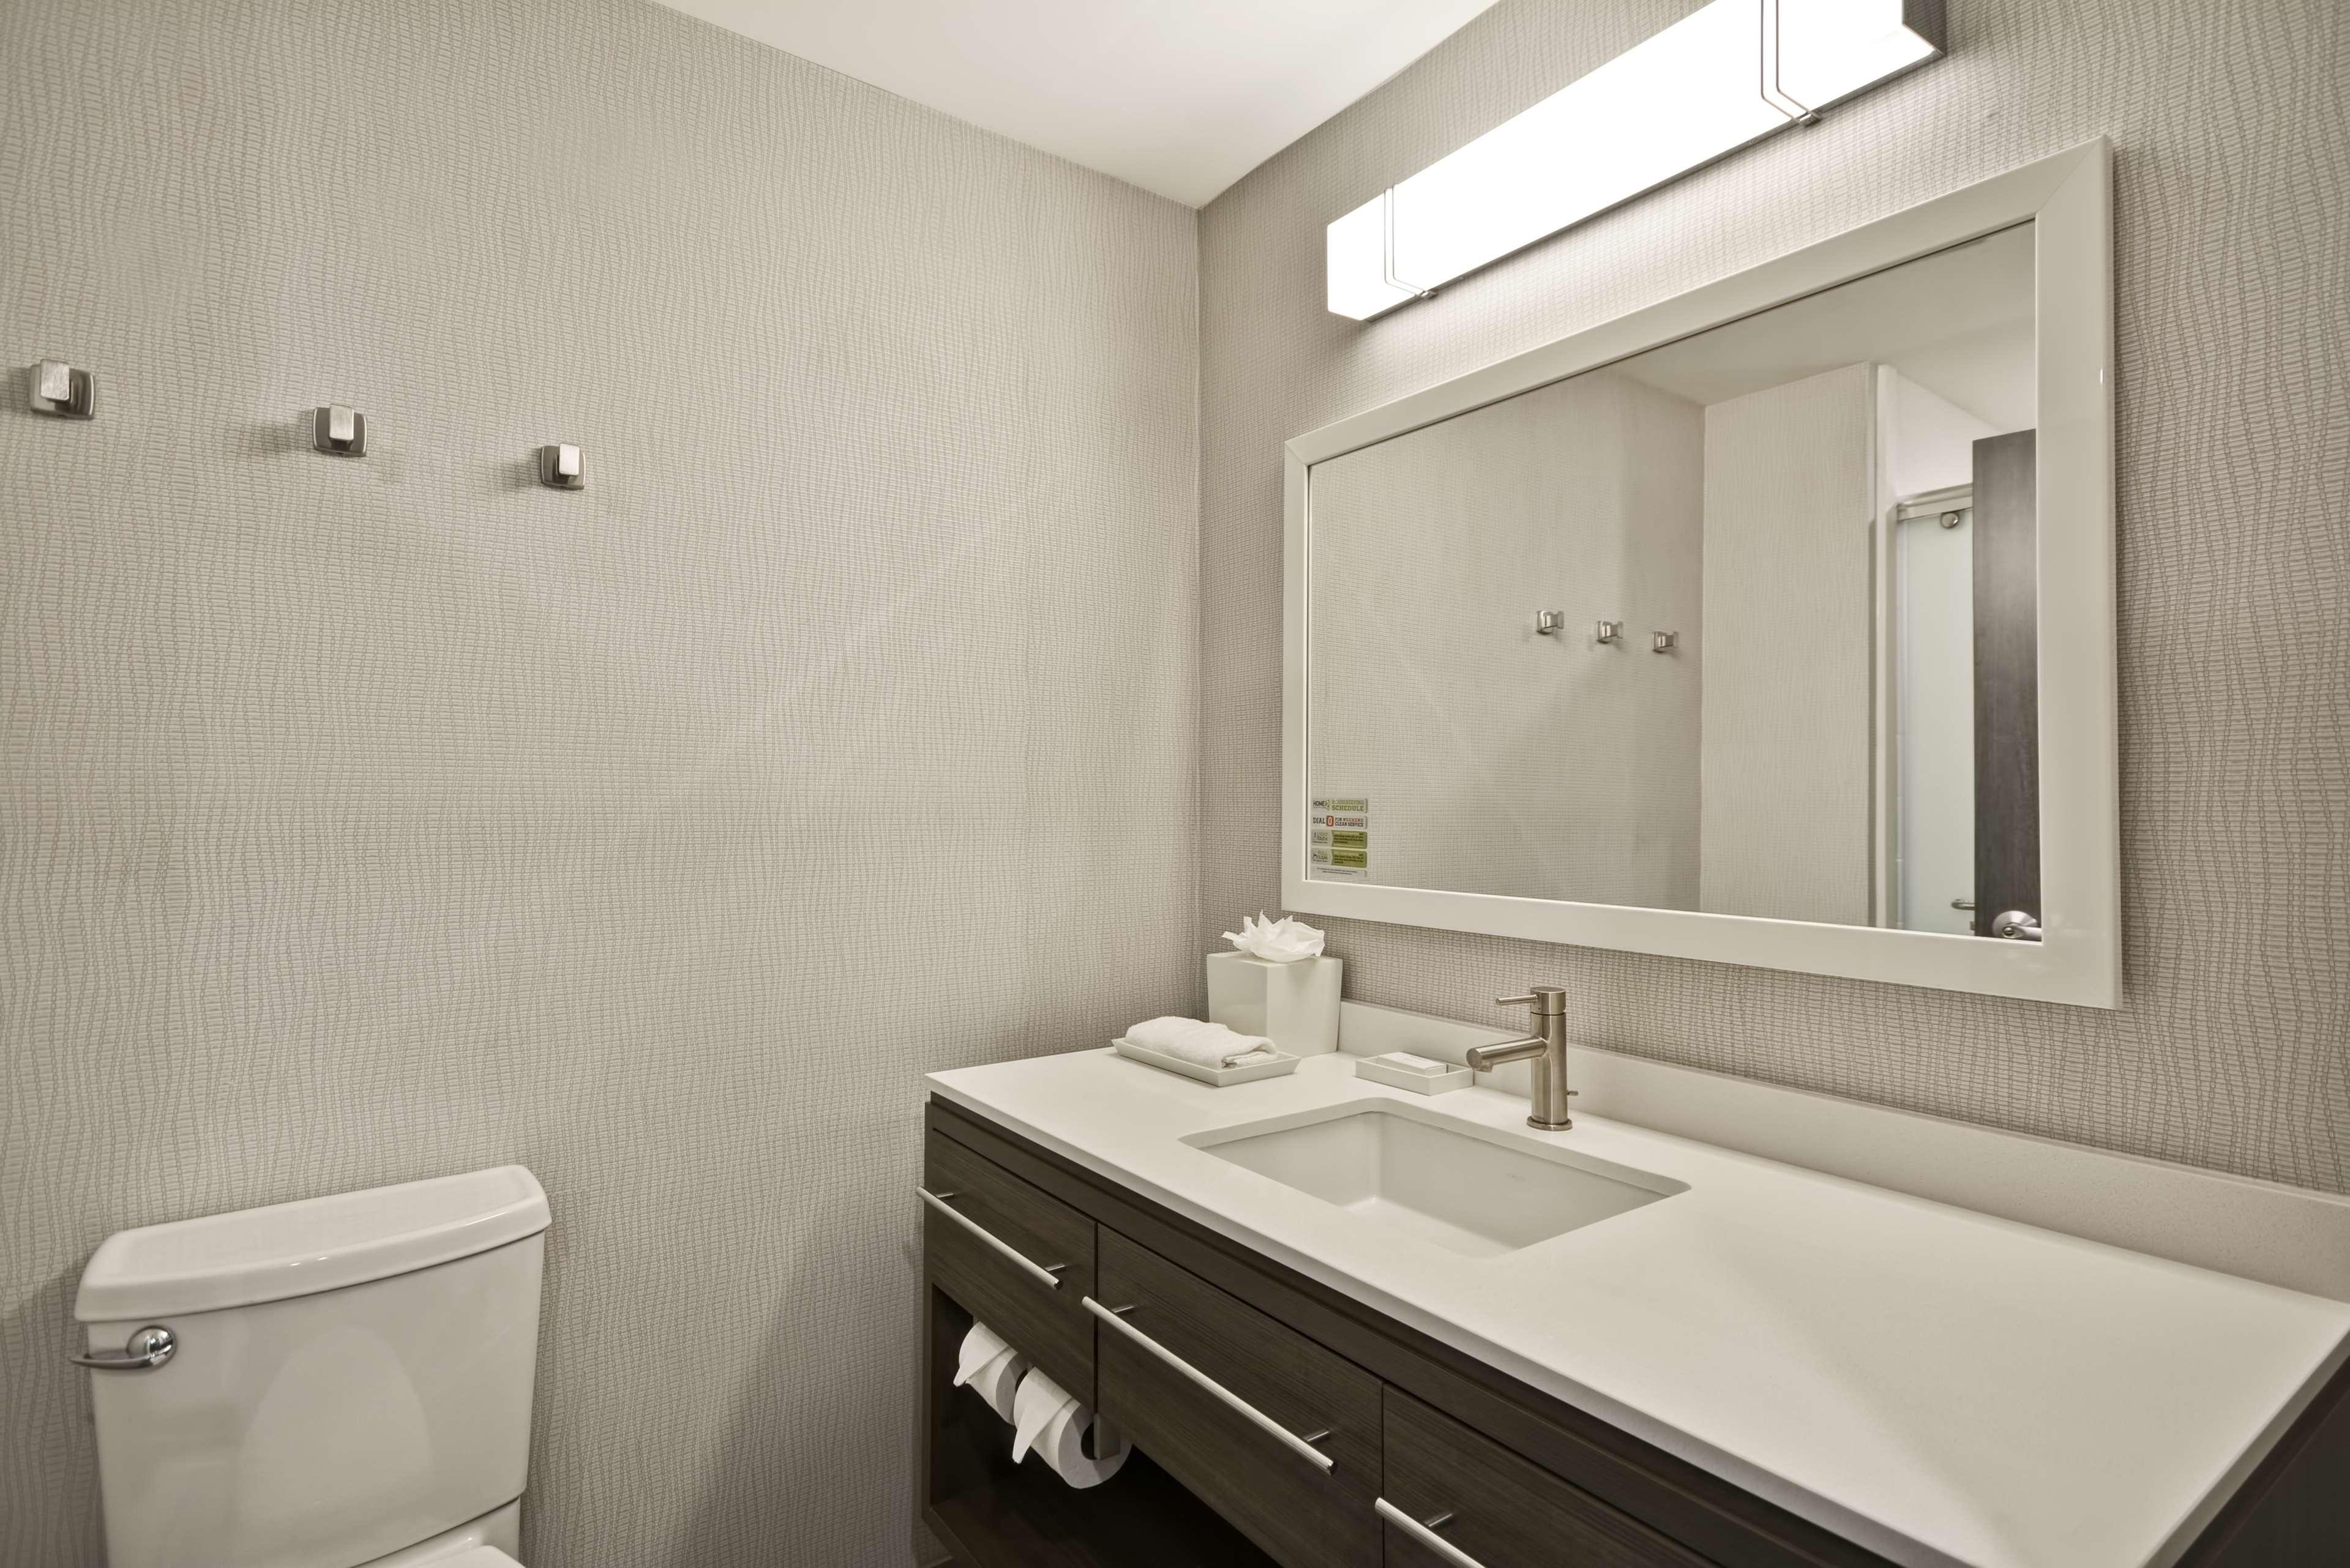 Home2 Suites by Hilton Atlanta West Lithia Springs image 22